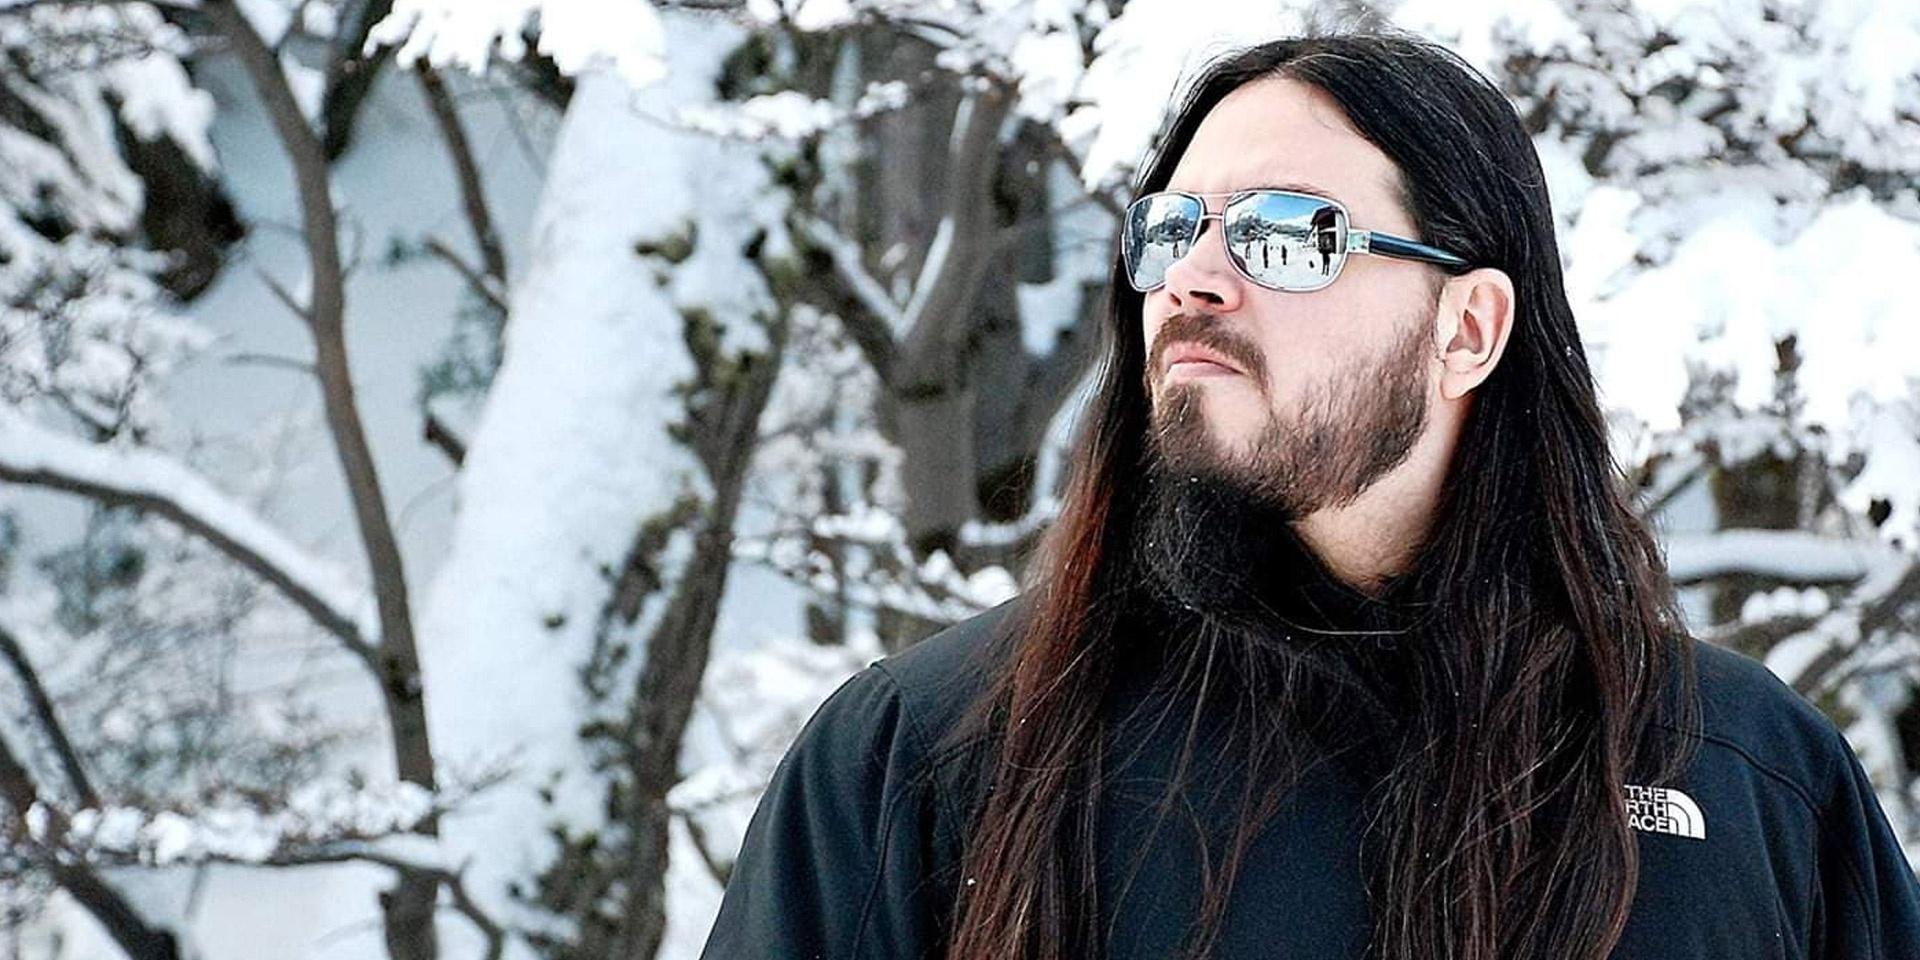 Slayer, Kreator, Dimmu Borgir visual artist Marcelo Vasco talks collab with Valley Of Chrome